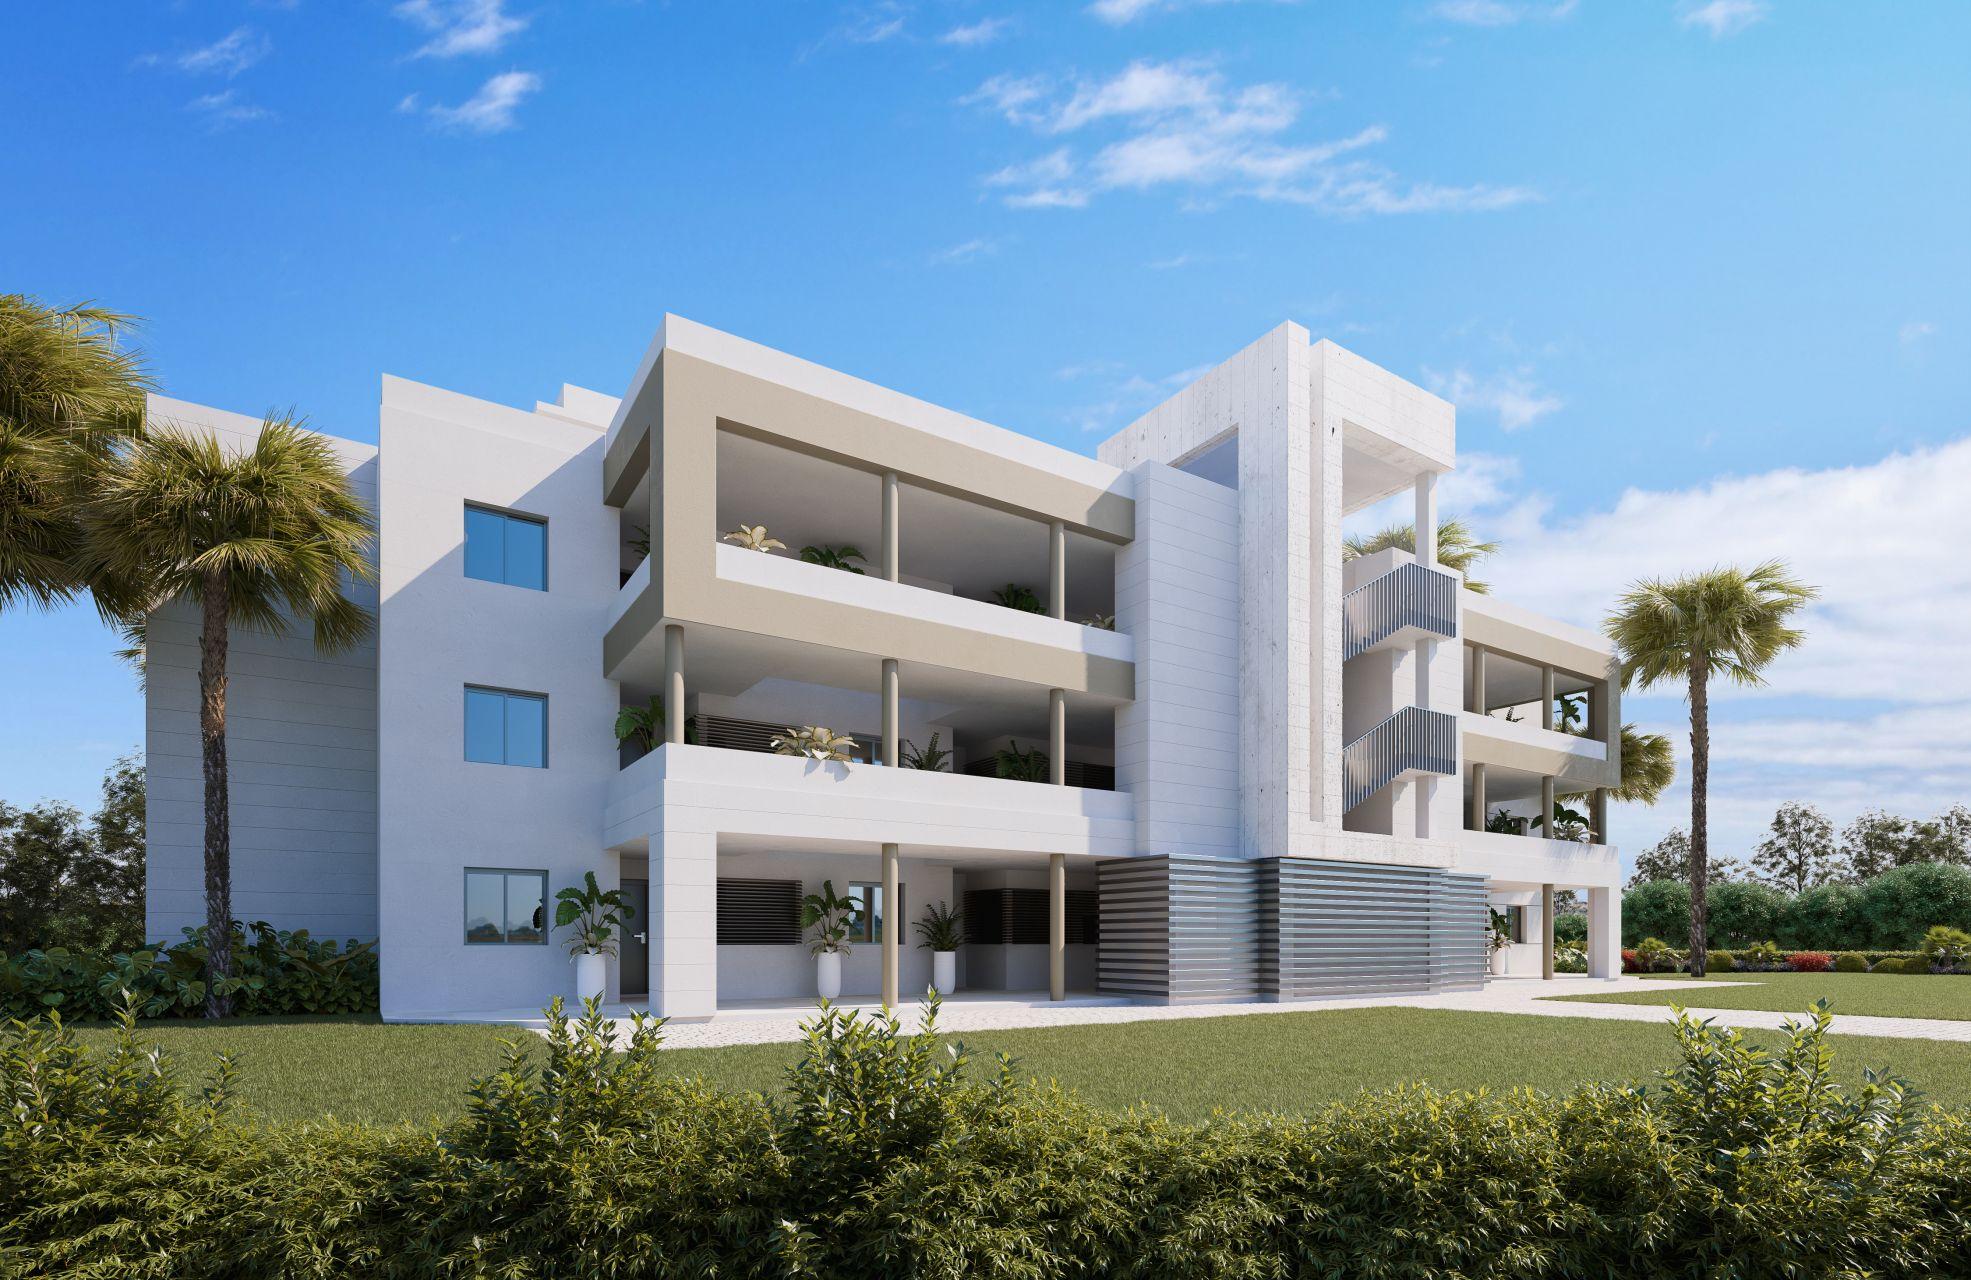 New Build in Mijas